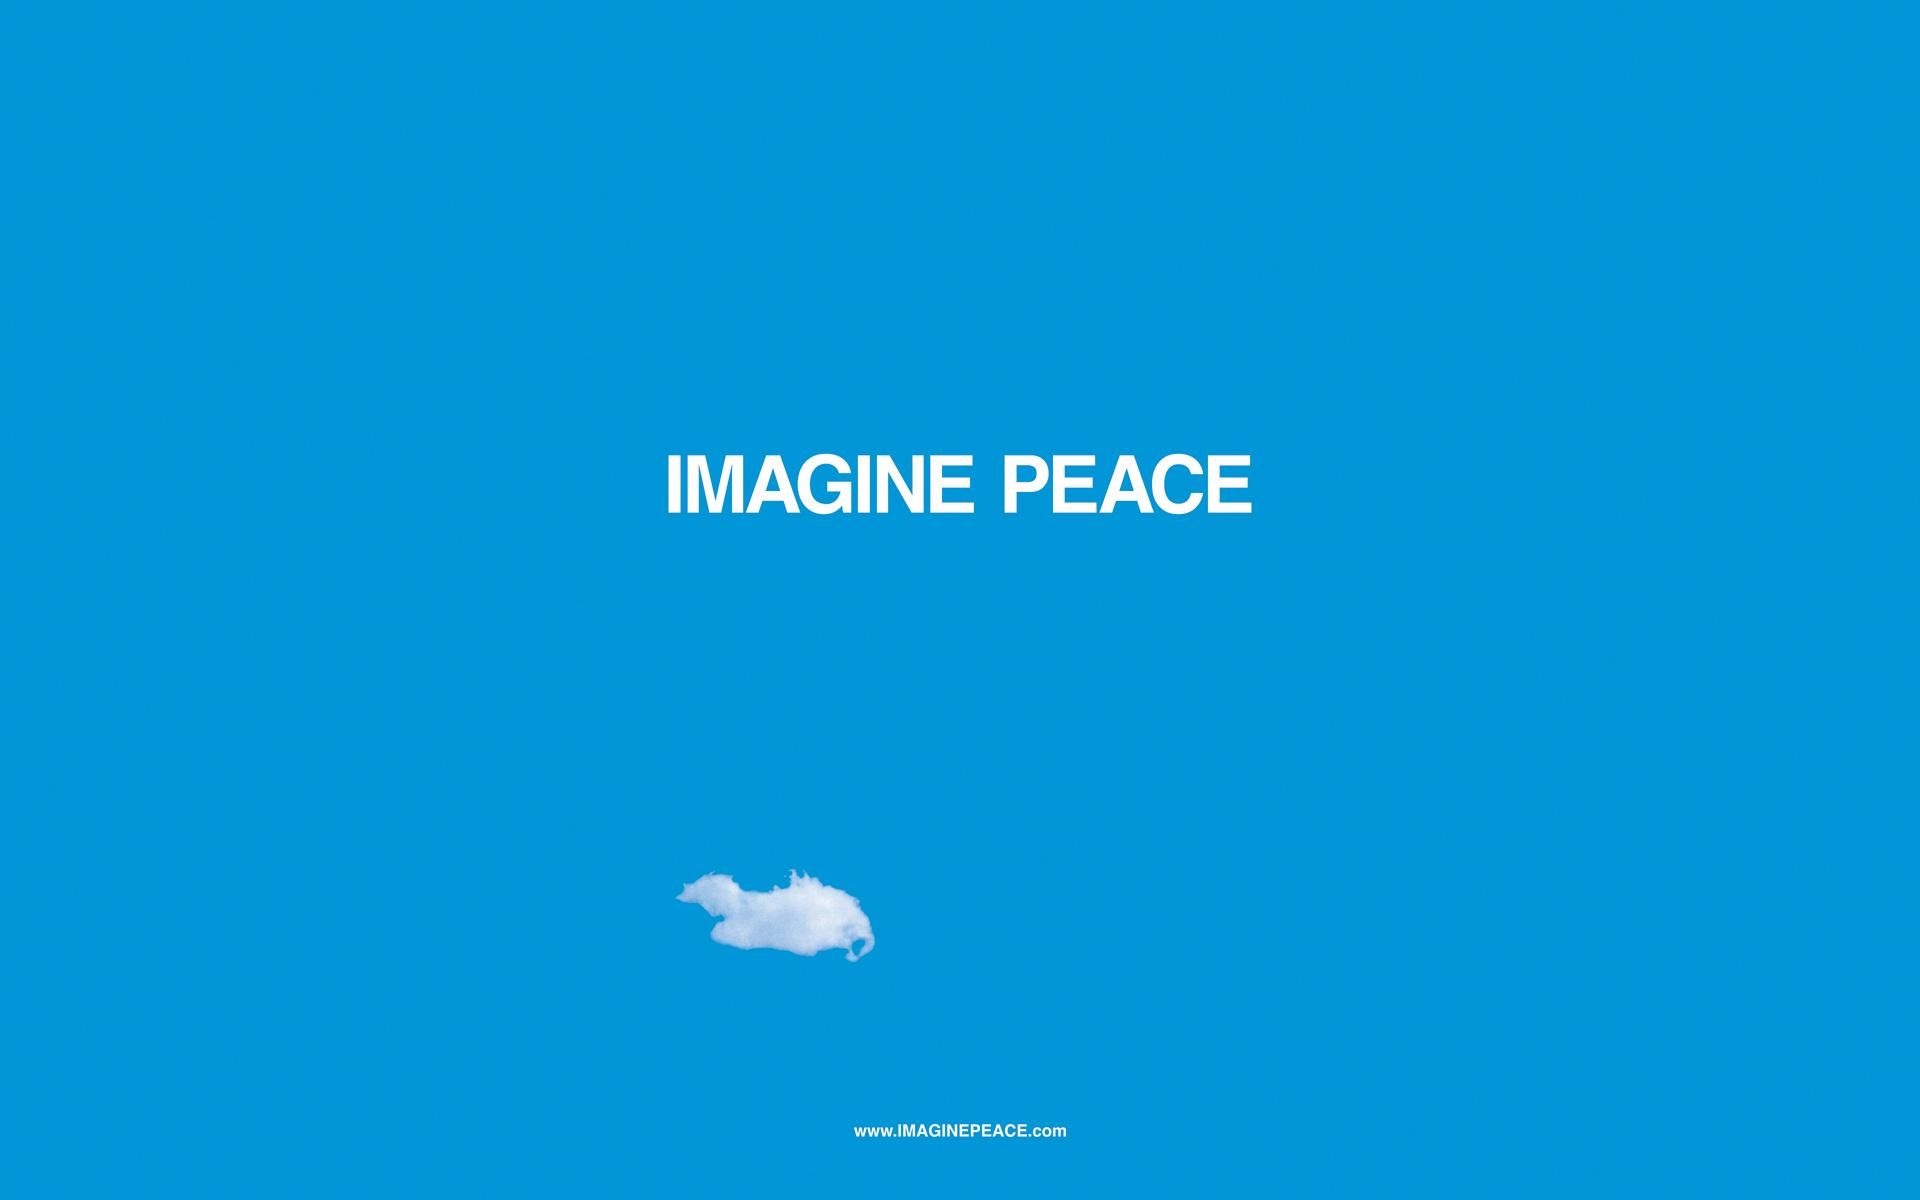 Imagine Peace wallpaper - 93199